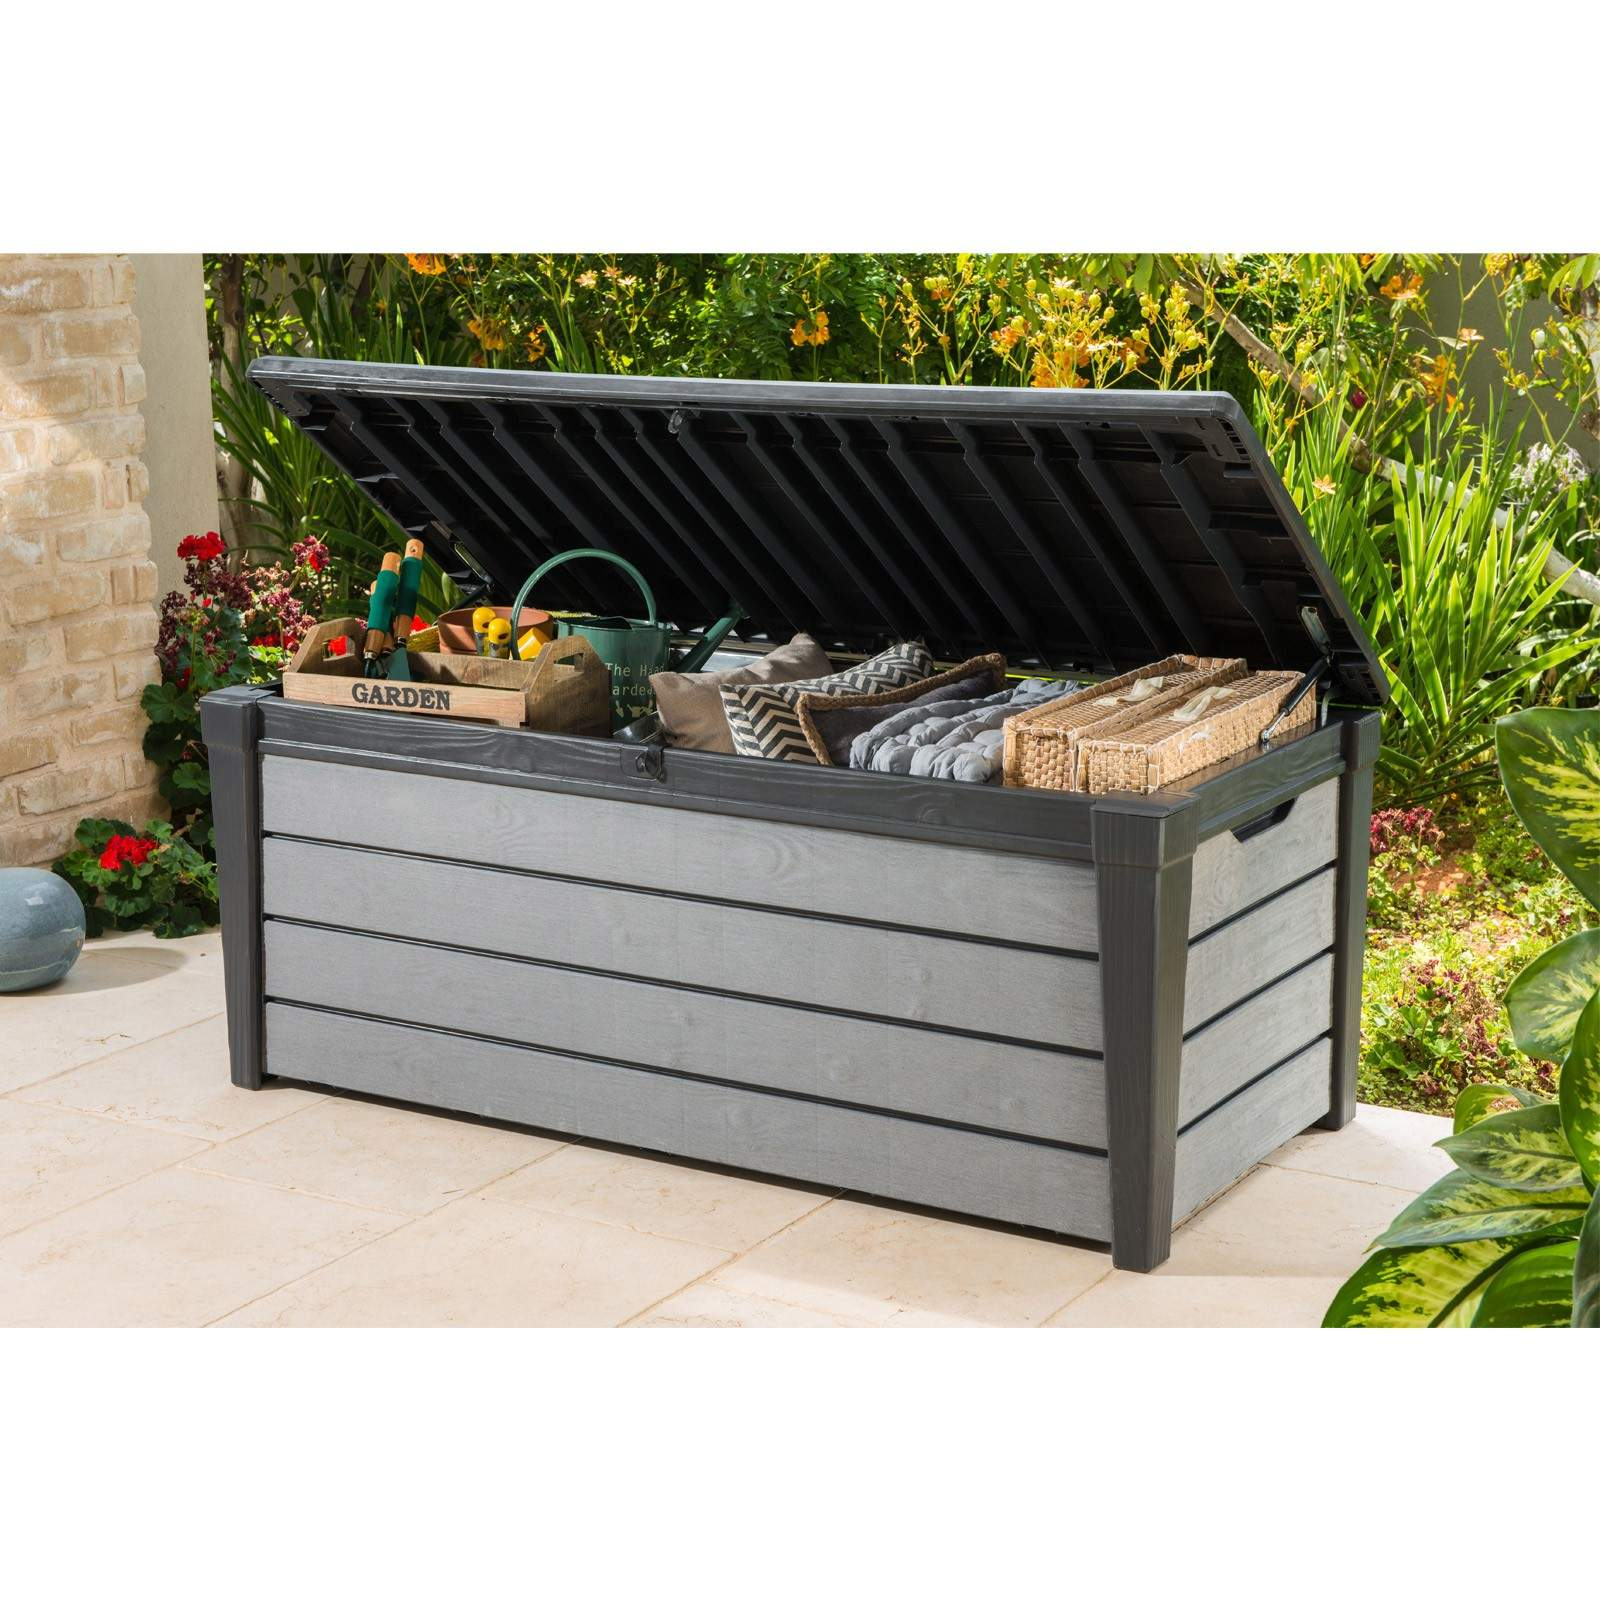 Aufbewahrungsbox Garten Luxus Keter Garten Box Kissentruhe Holzoptik Brushwood 455 Liter